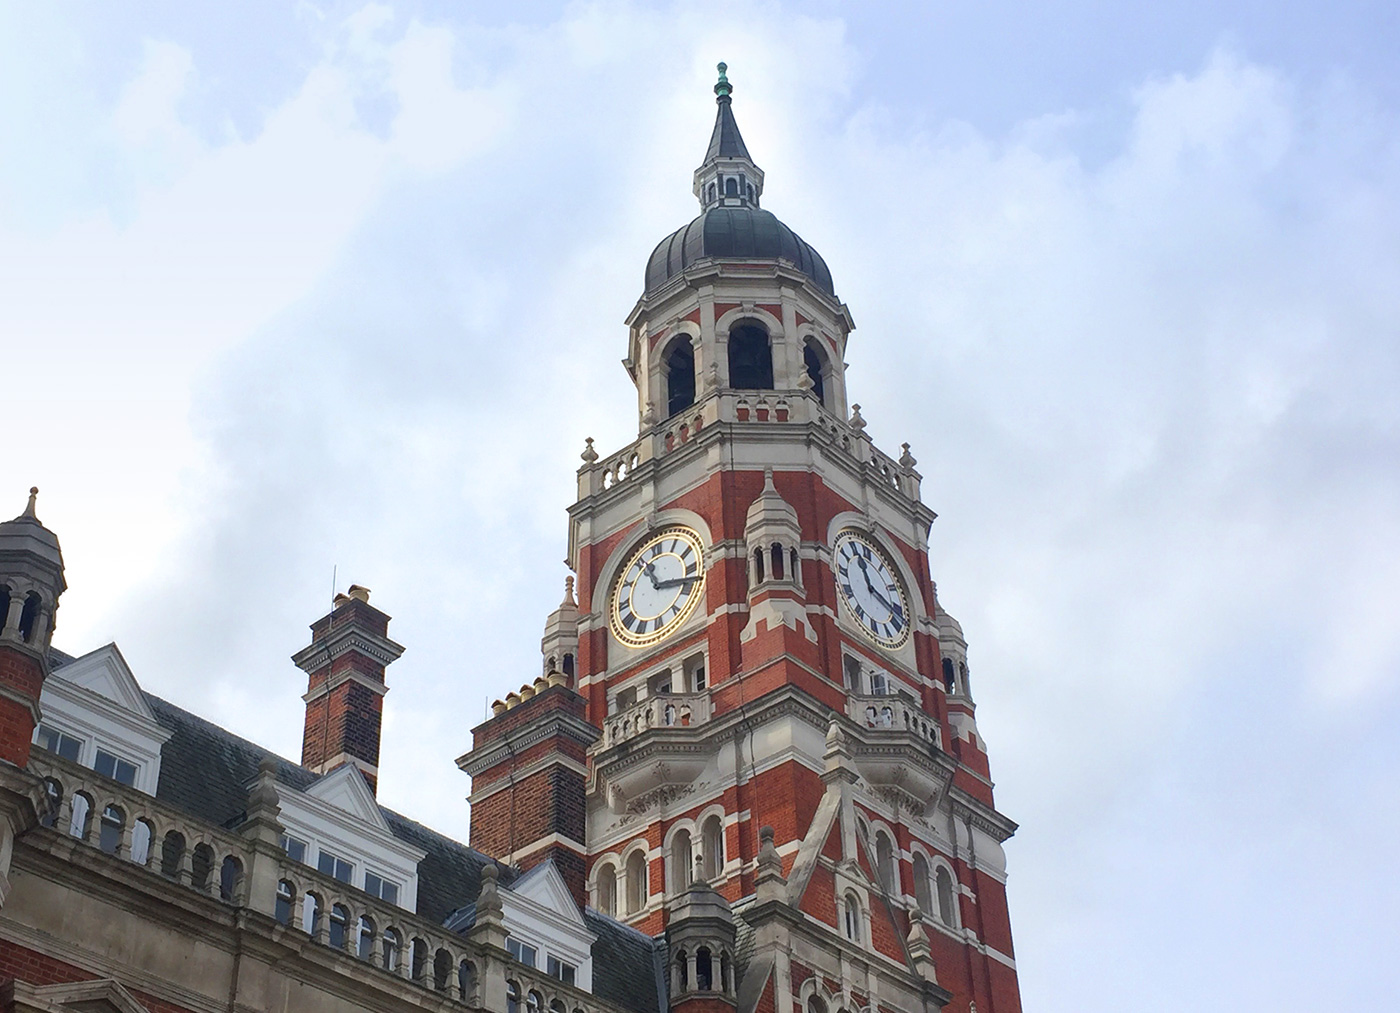 Clocktower, Croydon